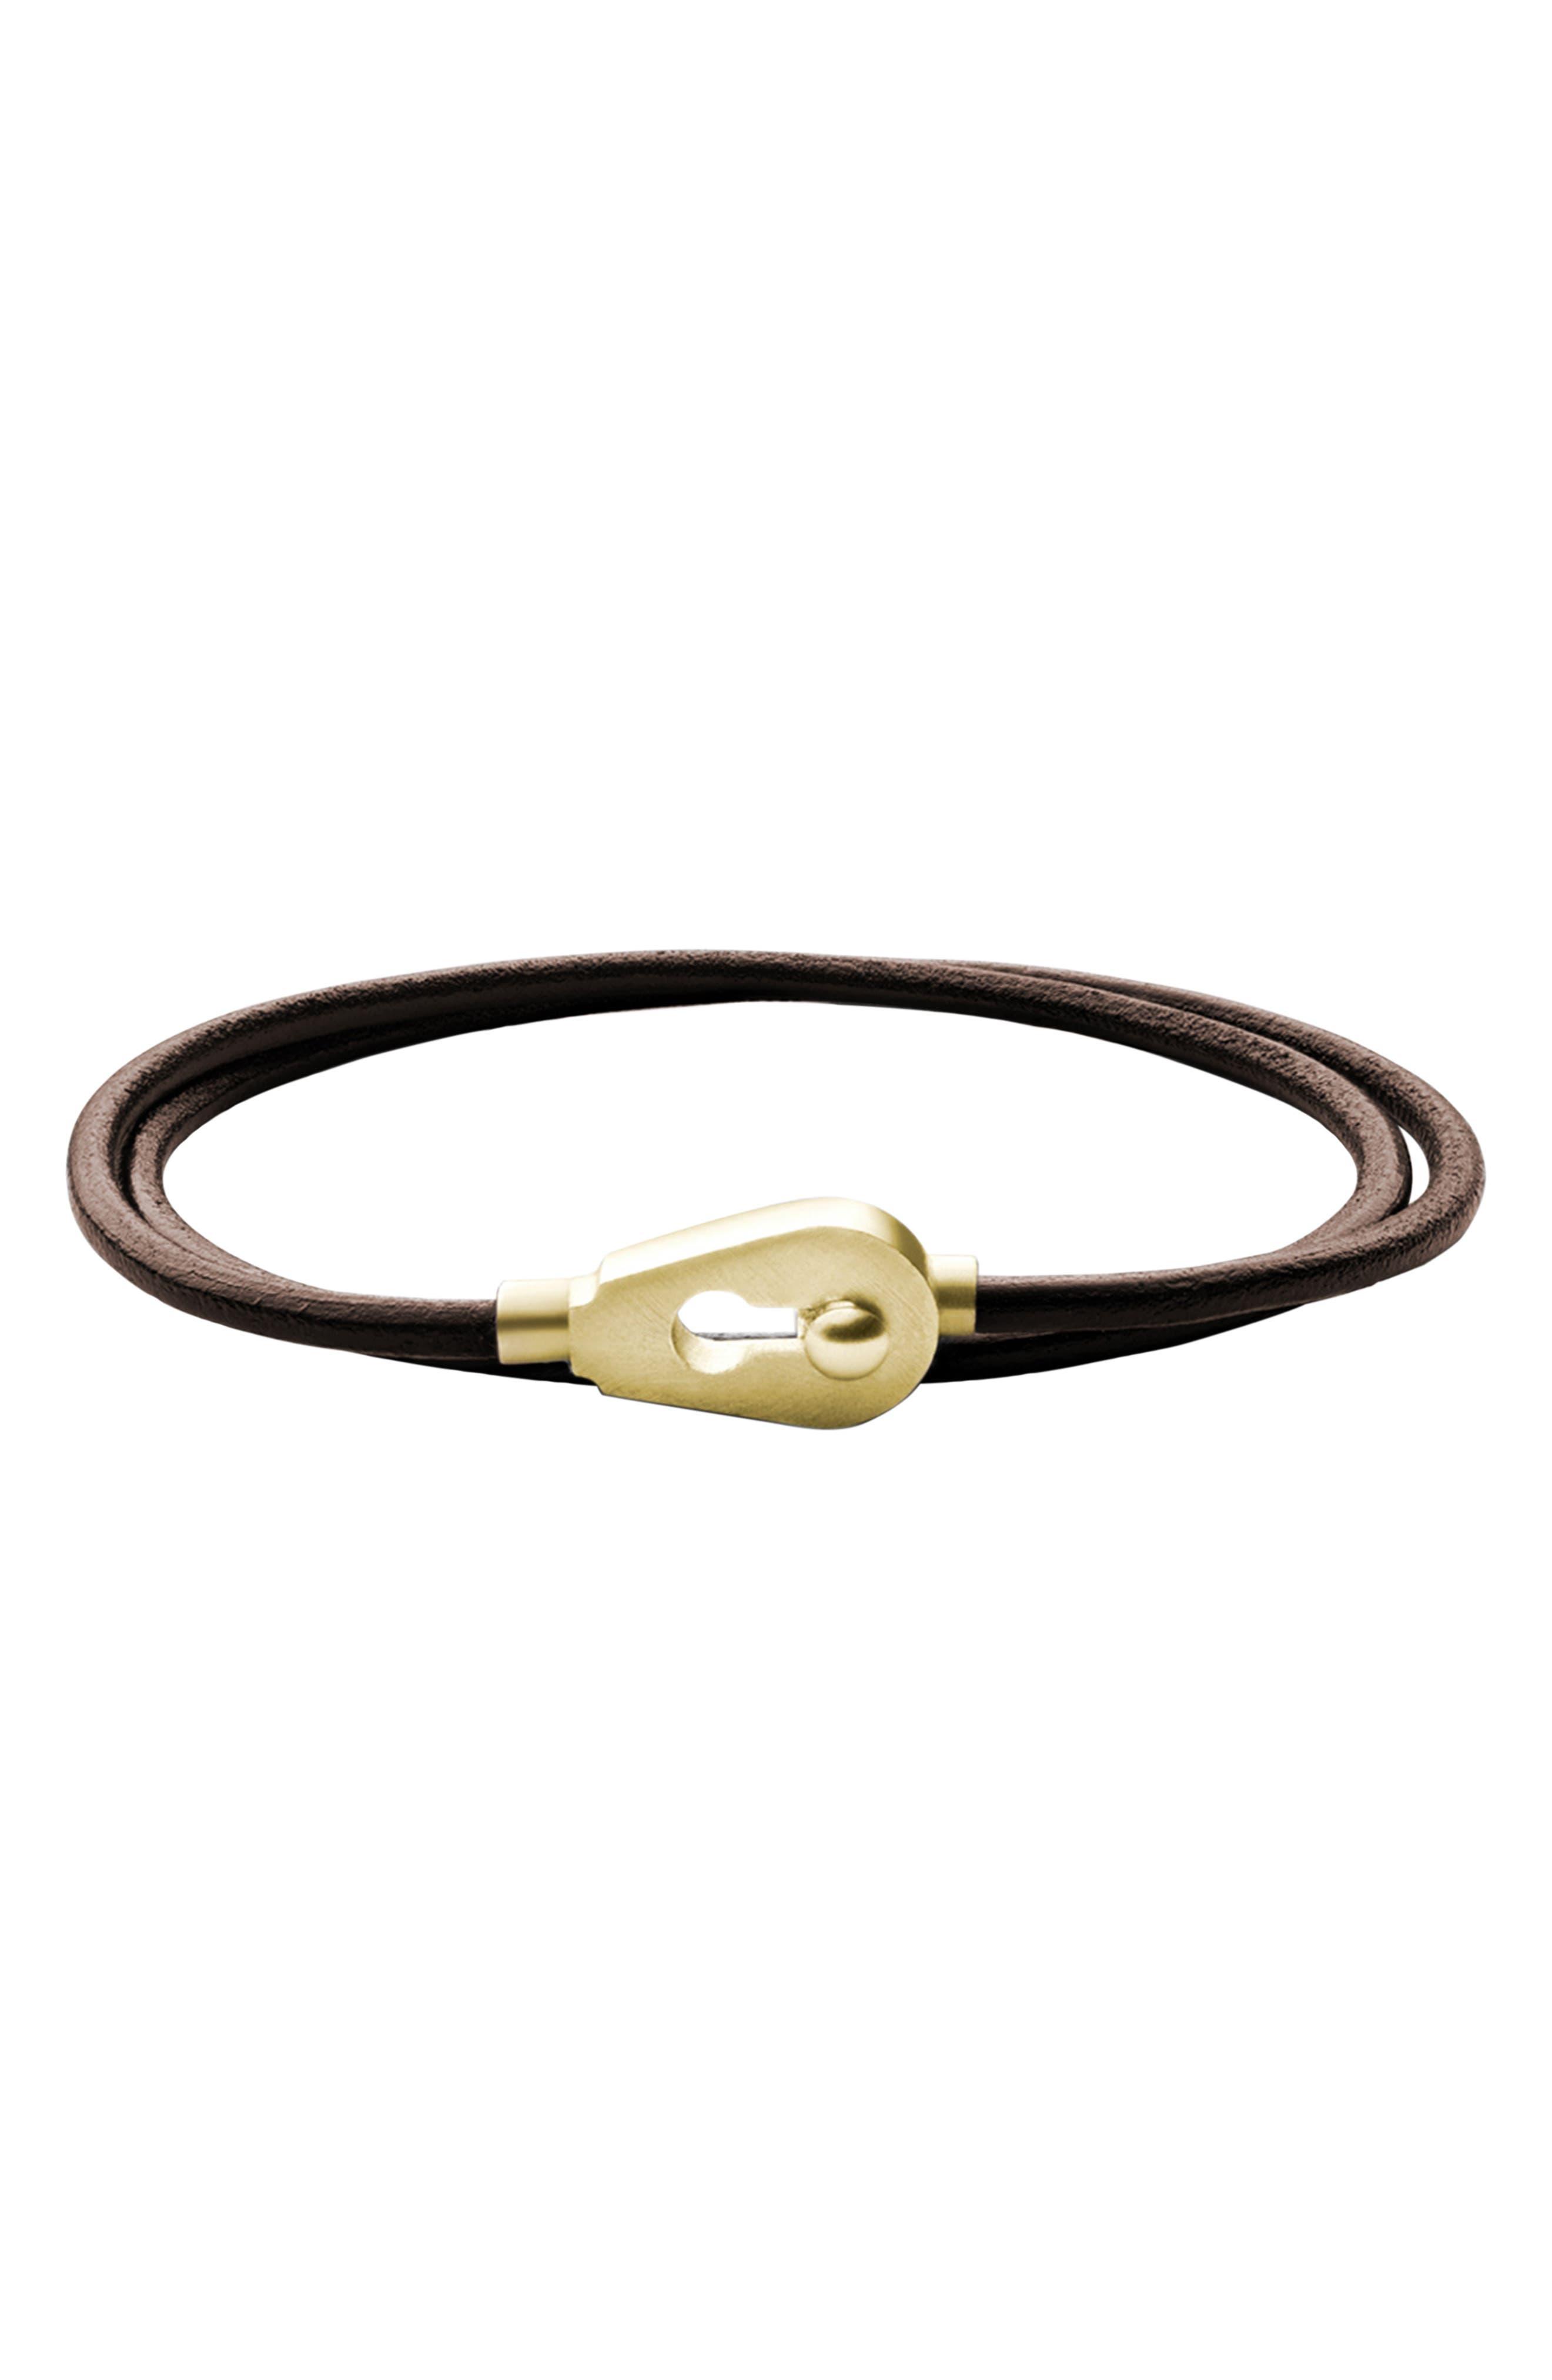 Centra Leather Wrap Bracelet,                         Main,                         color, BROWN